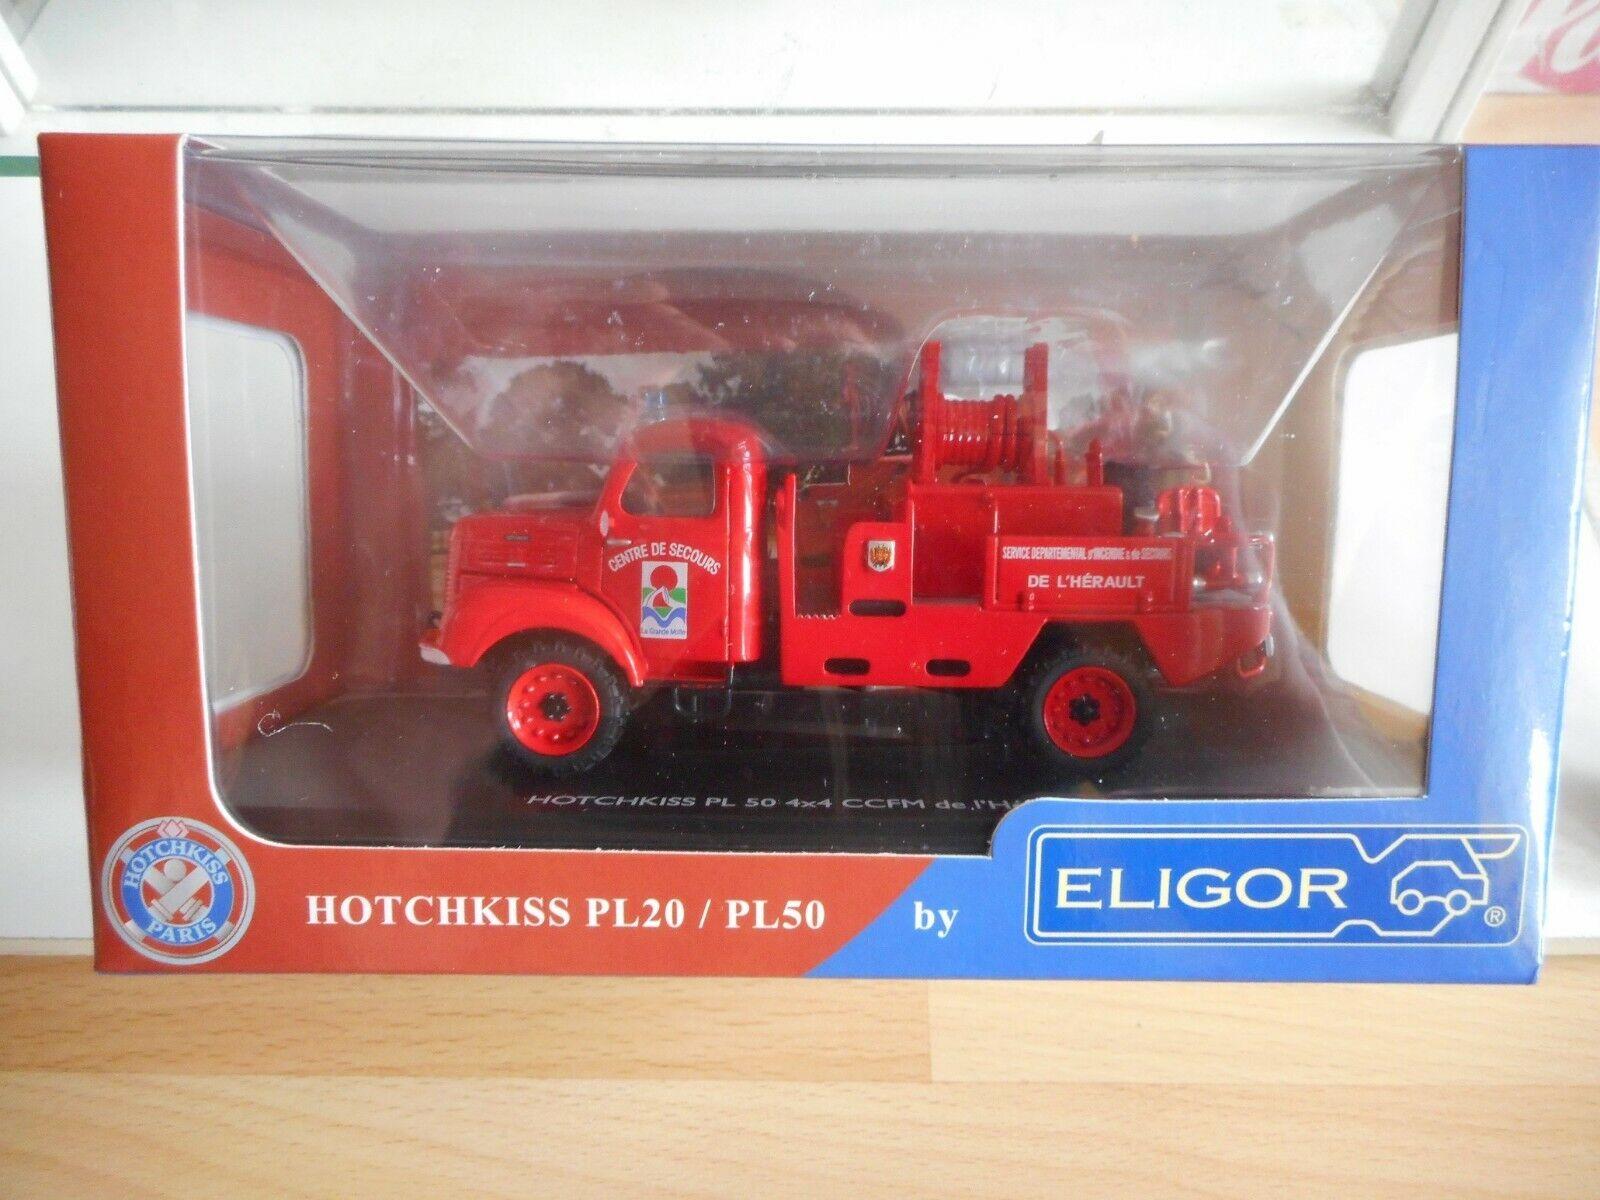 Eligor Hotchkiss PL 50 4x4 CCFM de l'Herault in rosso on 1 43  in Box